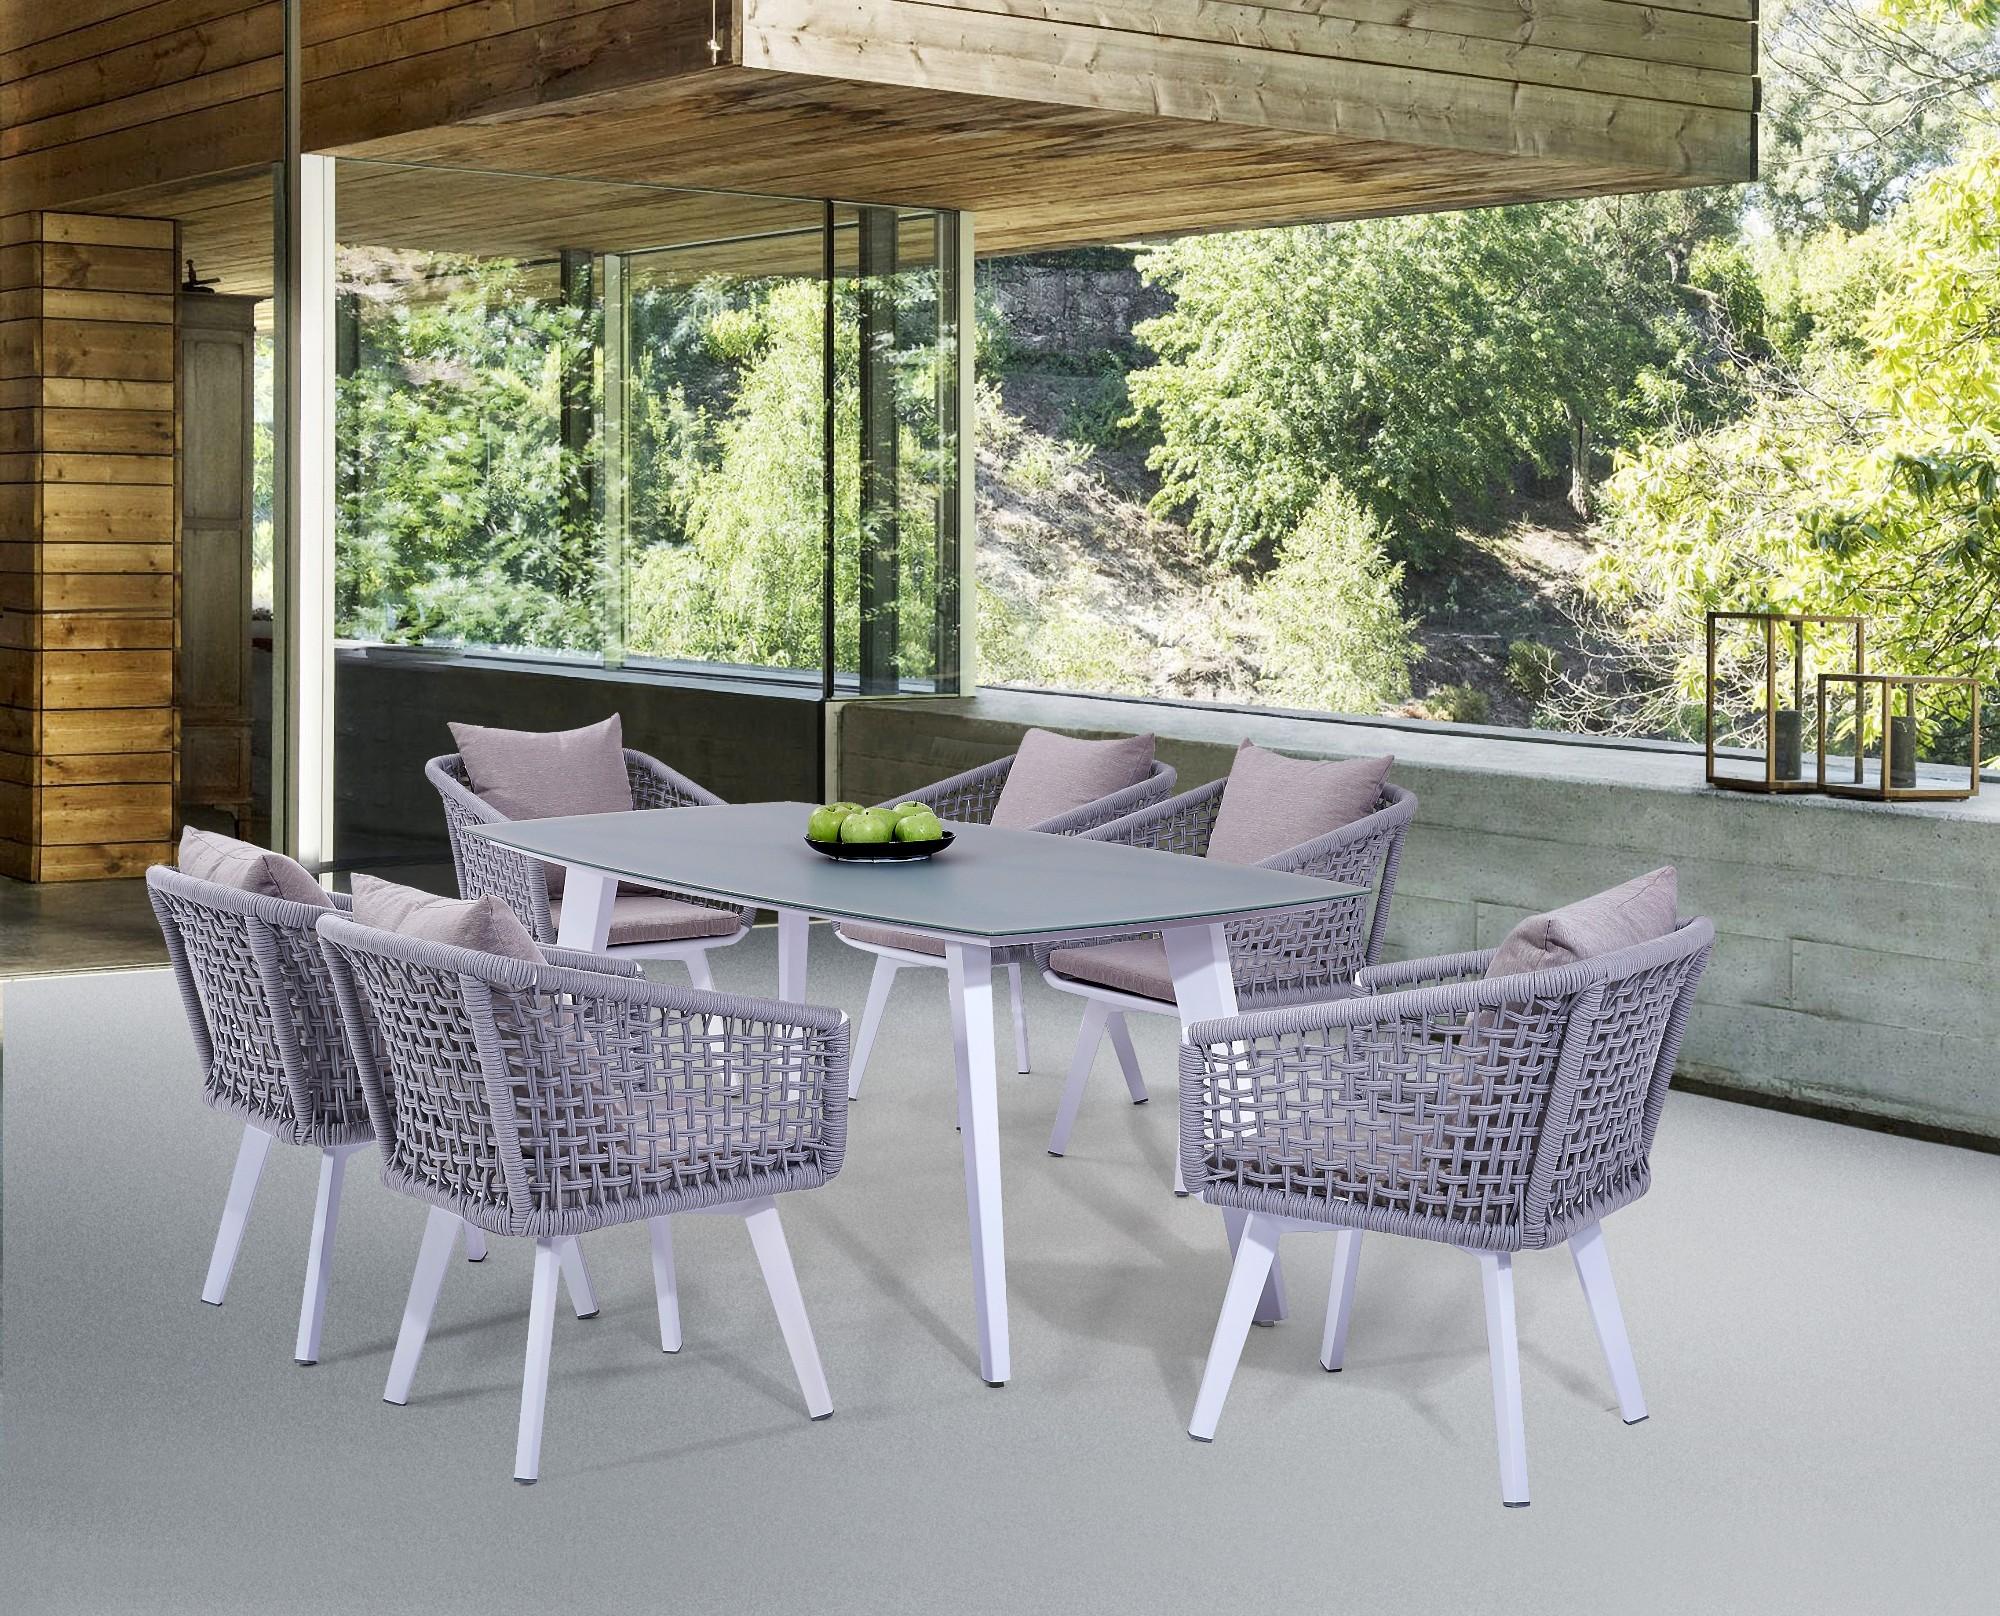 Outdoor Garden Furniture Rope Sofa Set Manufacturers, Outdoor Garden Furniture Rope Sofa Set Factory, Supply Outdoor Garden Furniture Rope Sofa Set